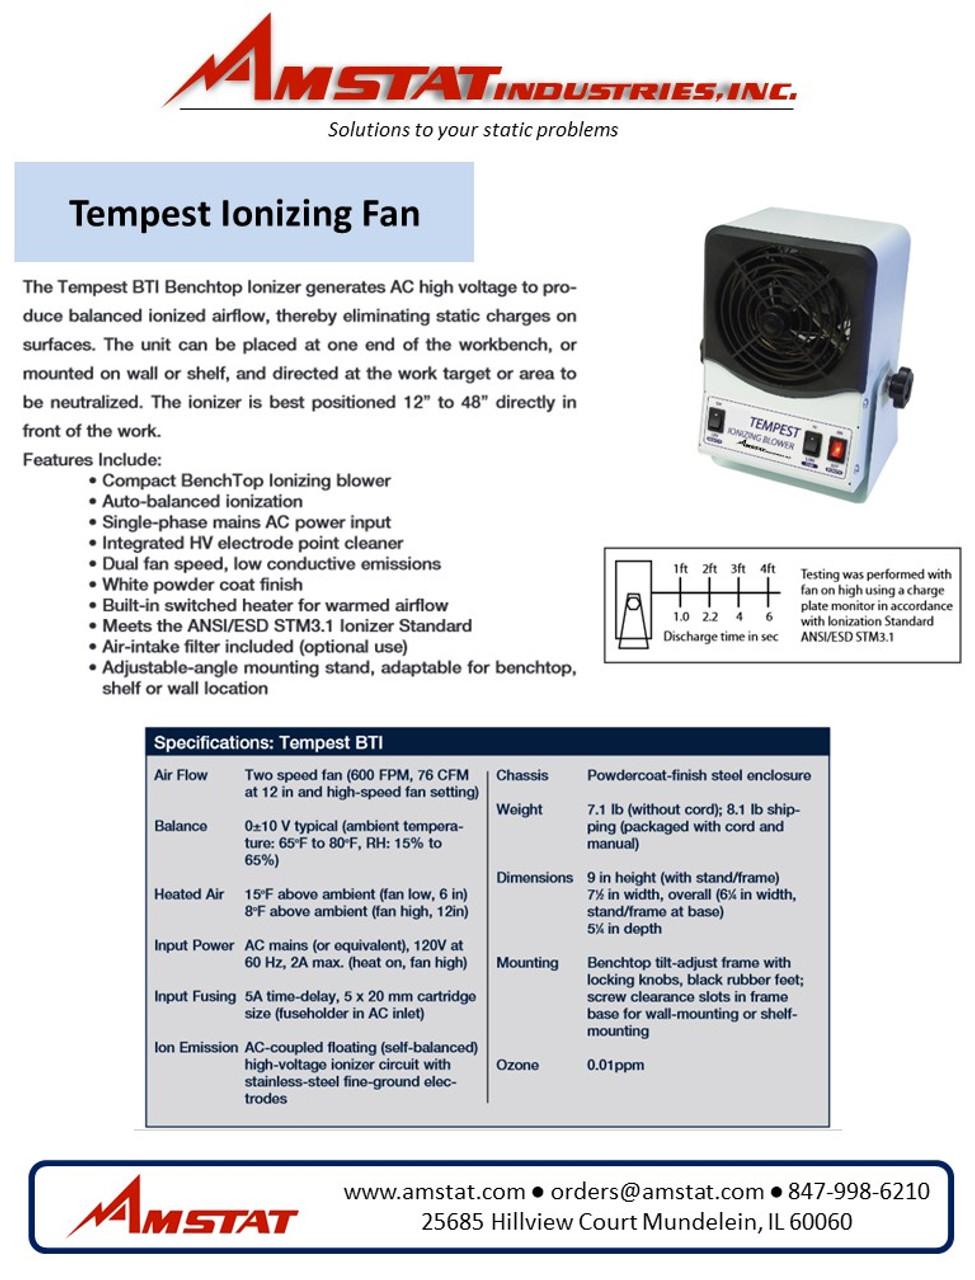 Tempest Ionizing Fan